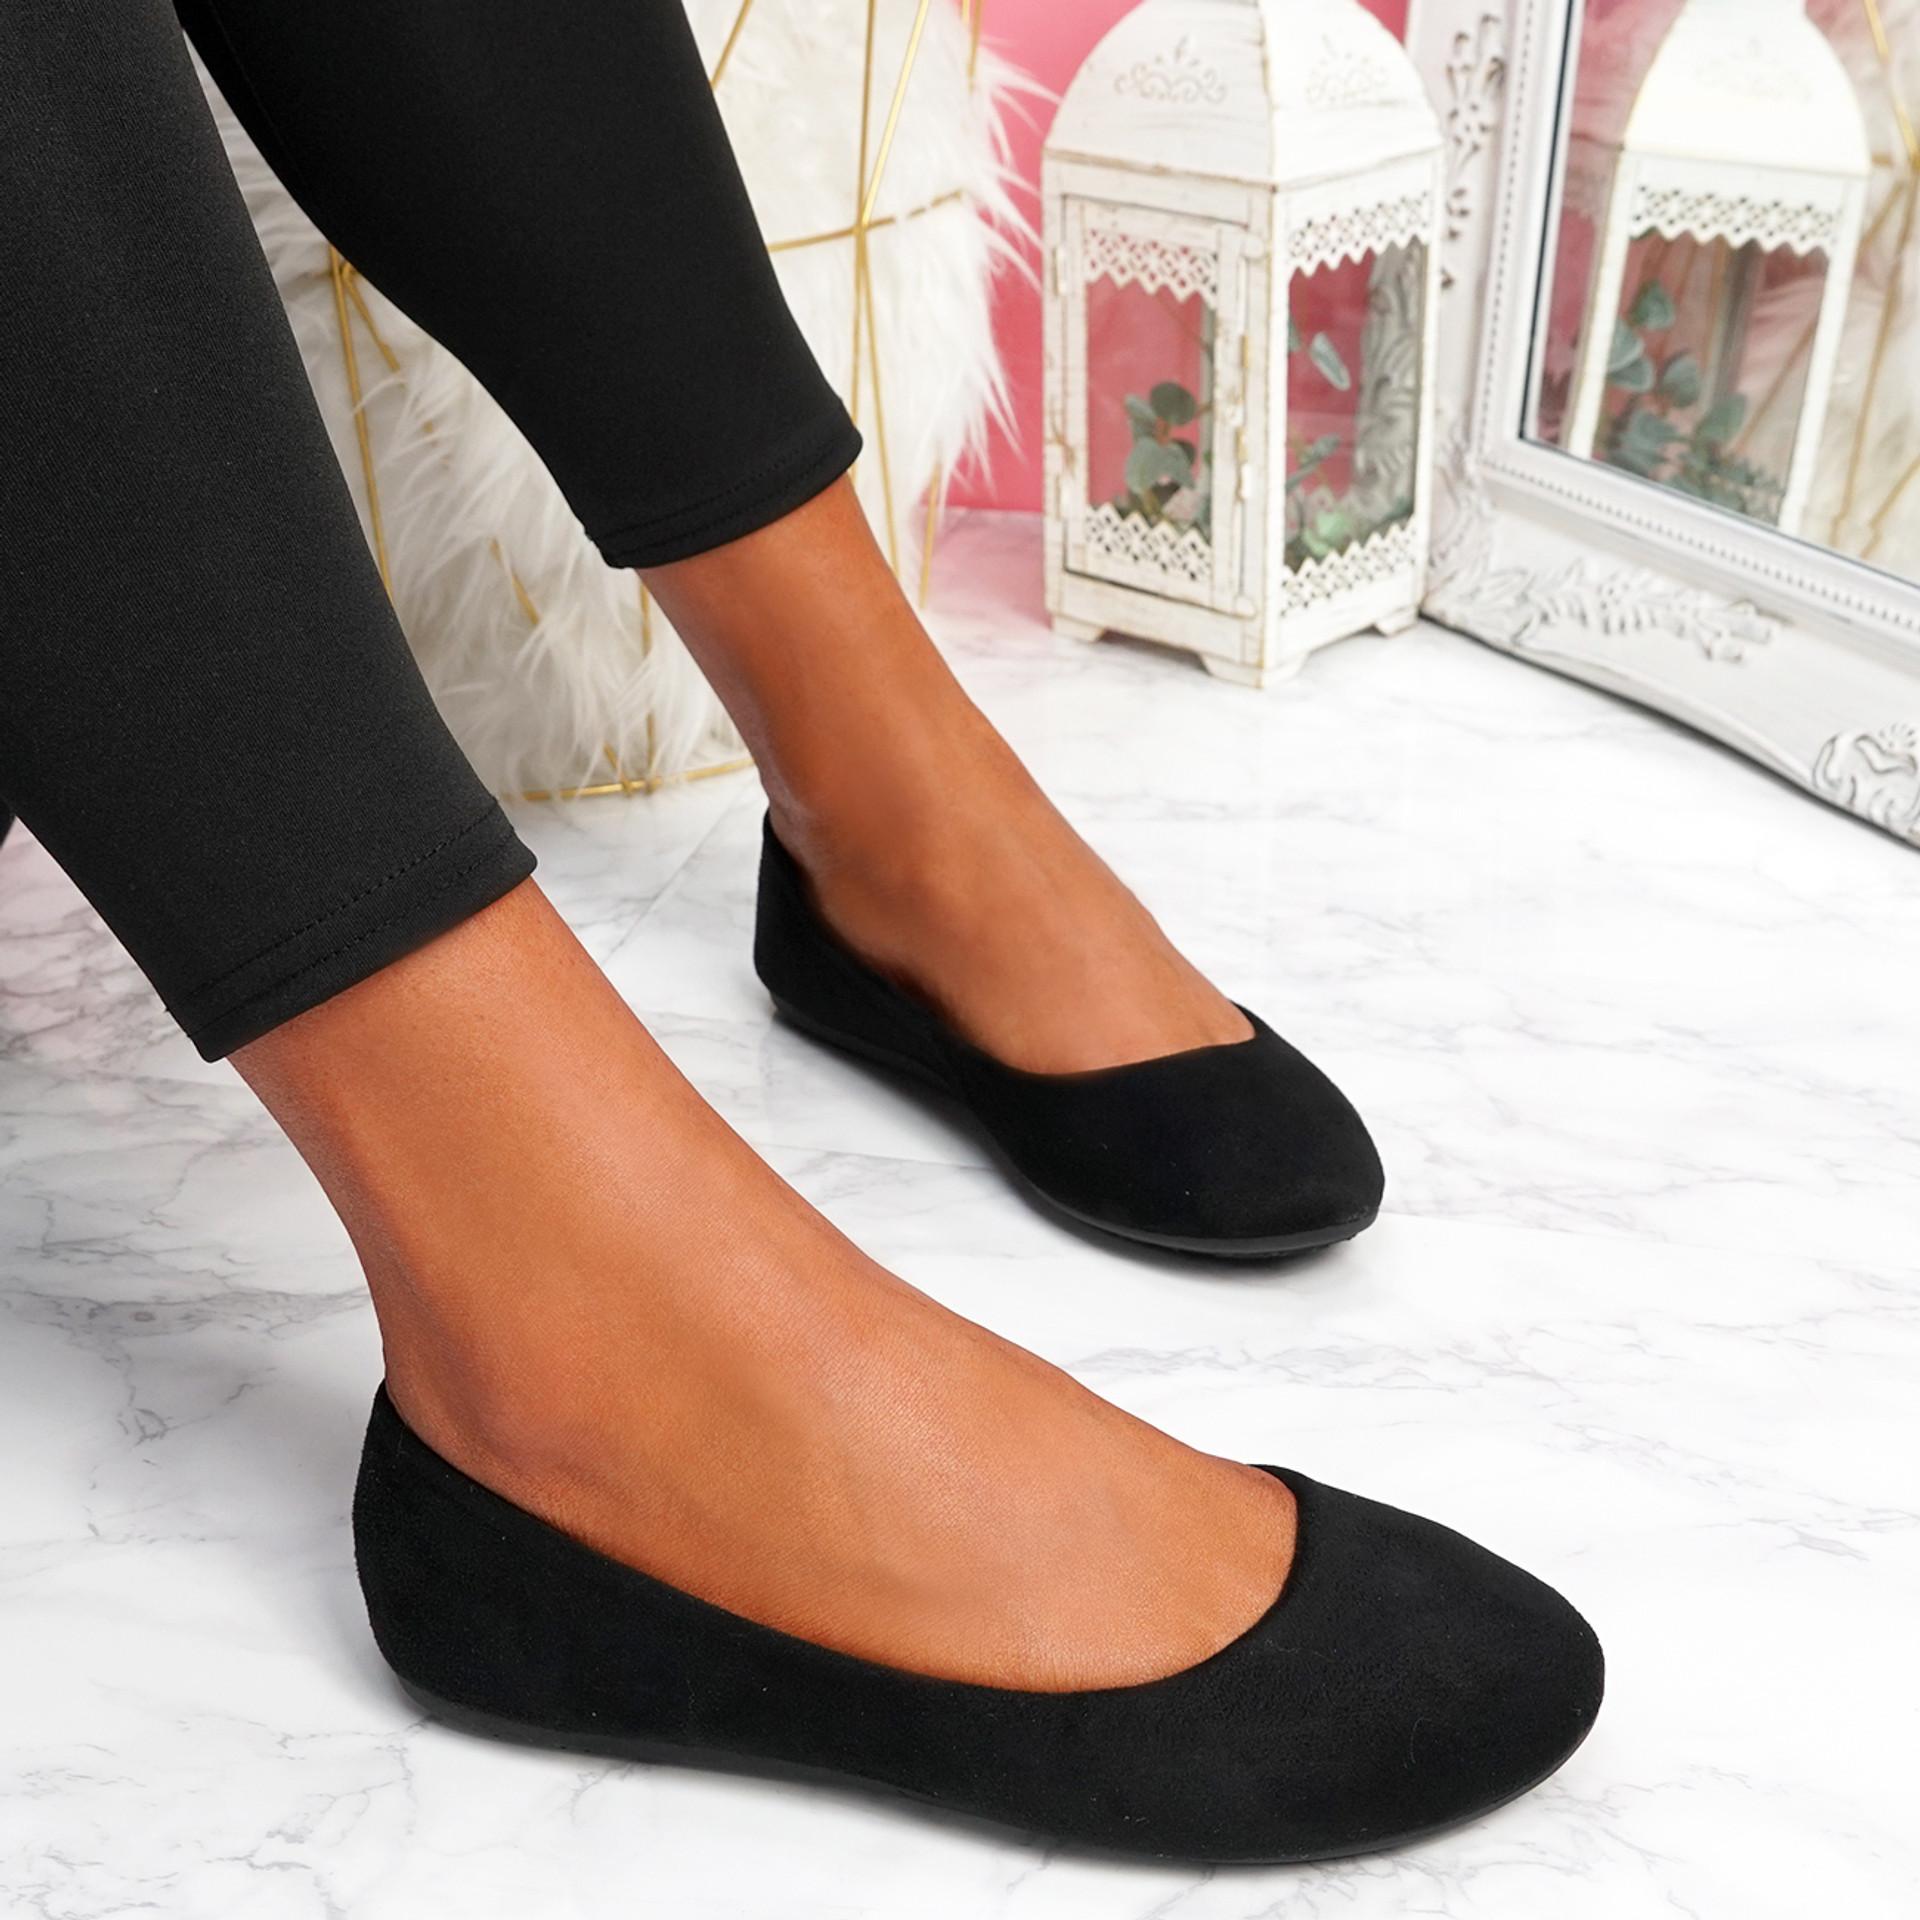 Evera Black Slip On Ballerinas